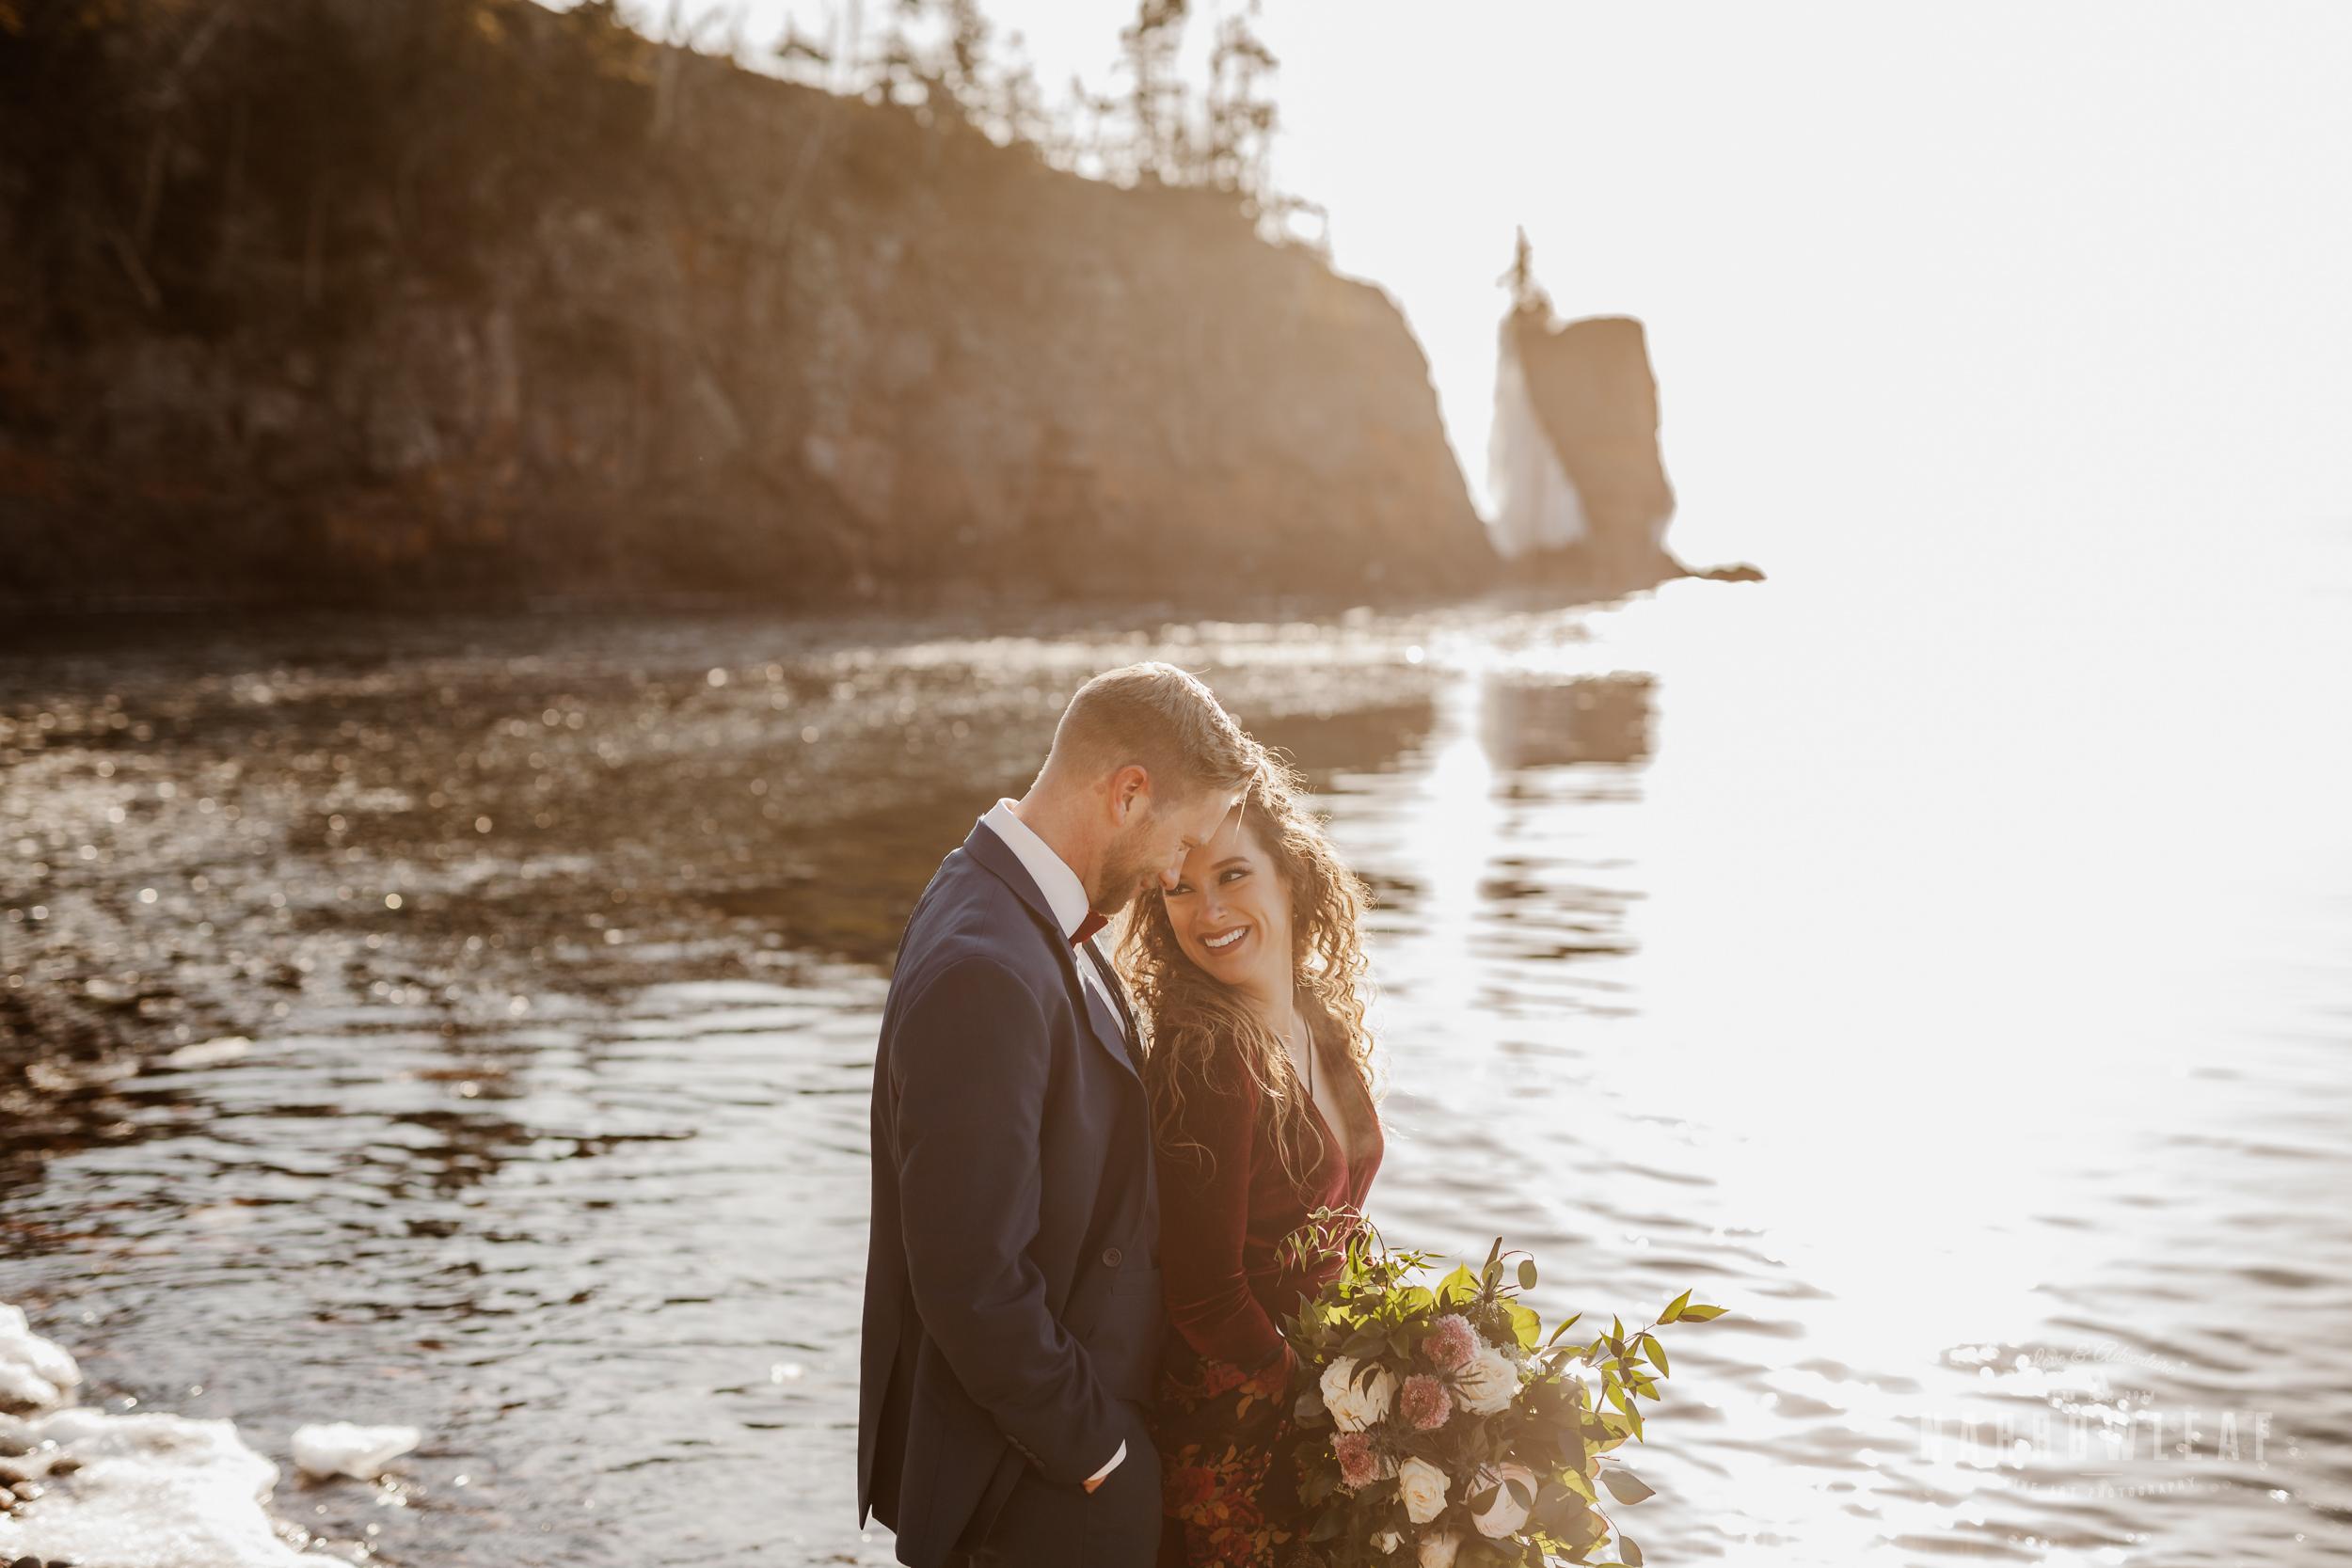 minnesota-adventure-elopement-Narrowleaf_Love_and_Adventure_Photography-7599.jpg